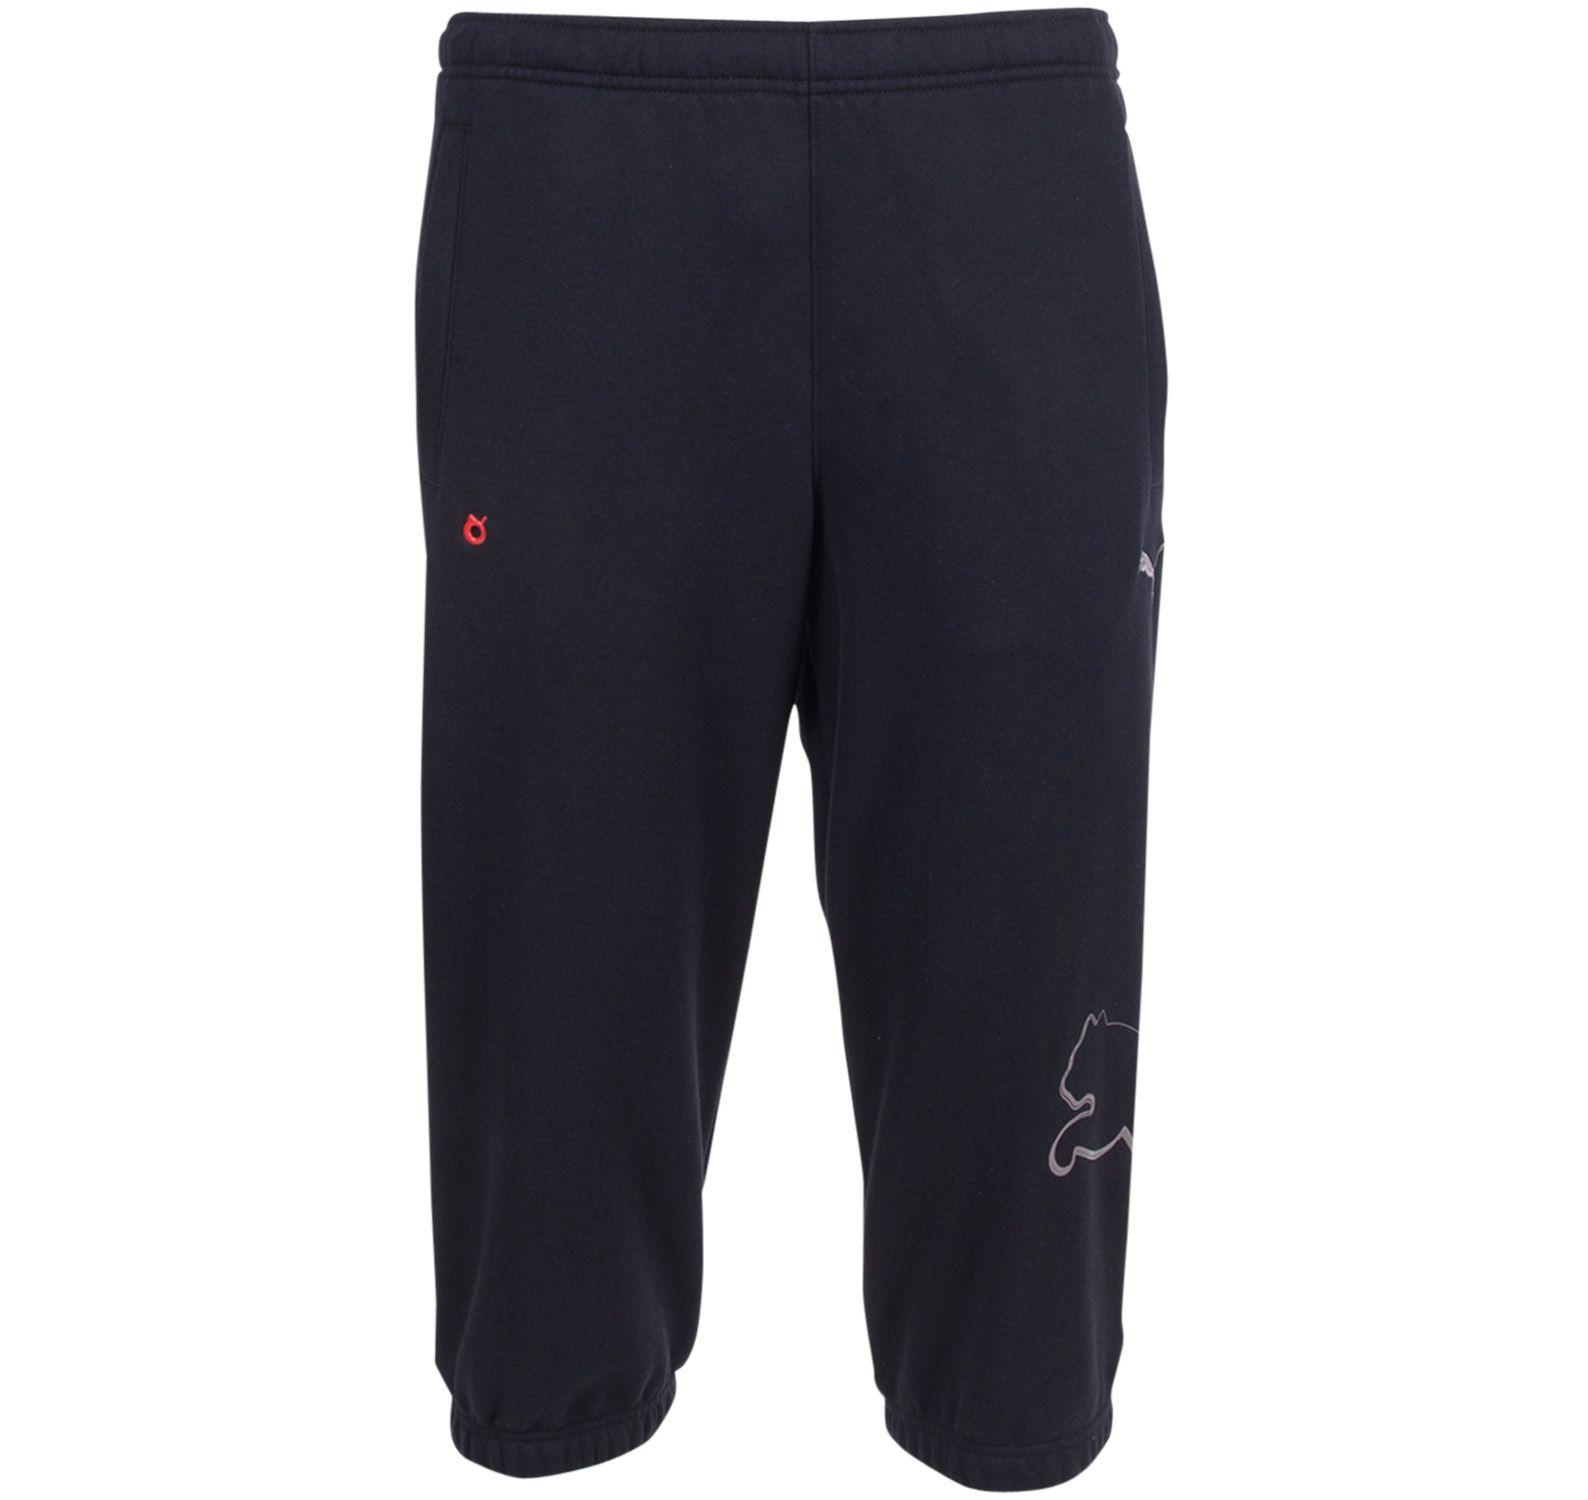 3/4 Sweat Pants, Black, S,  Puma